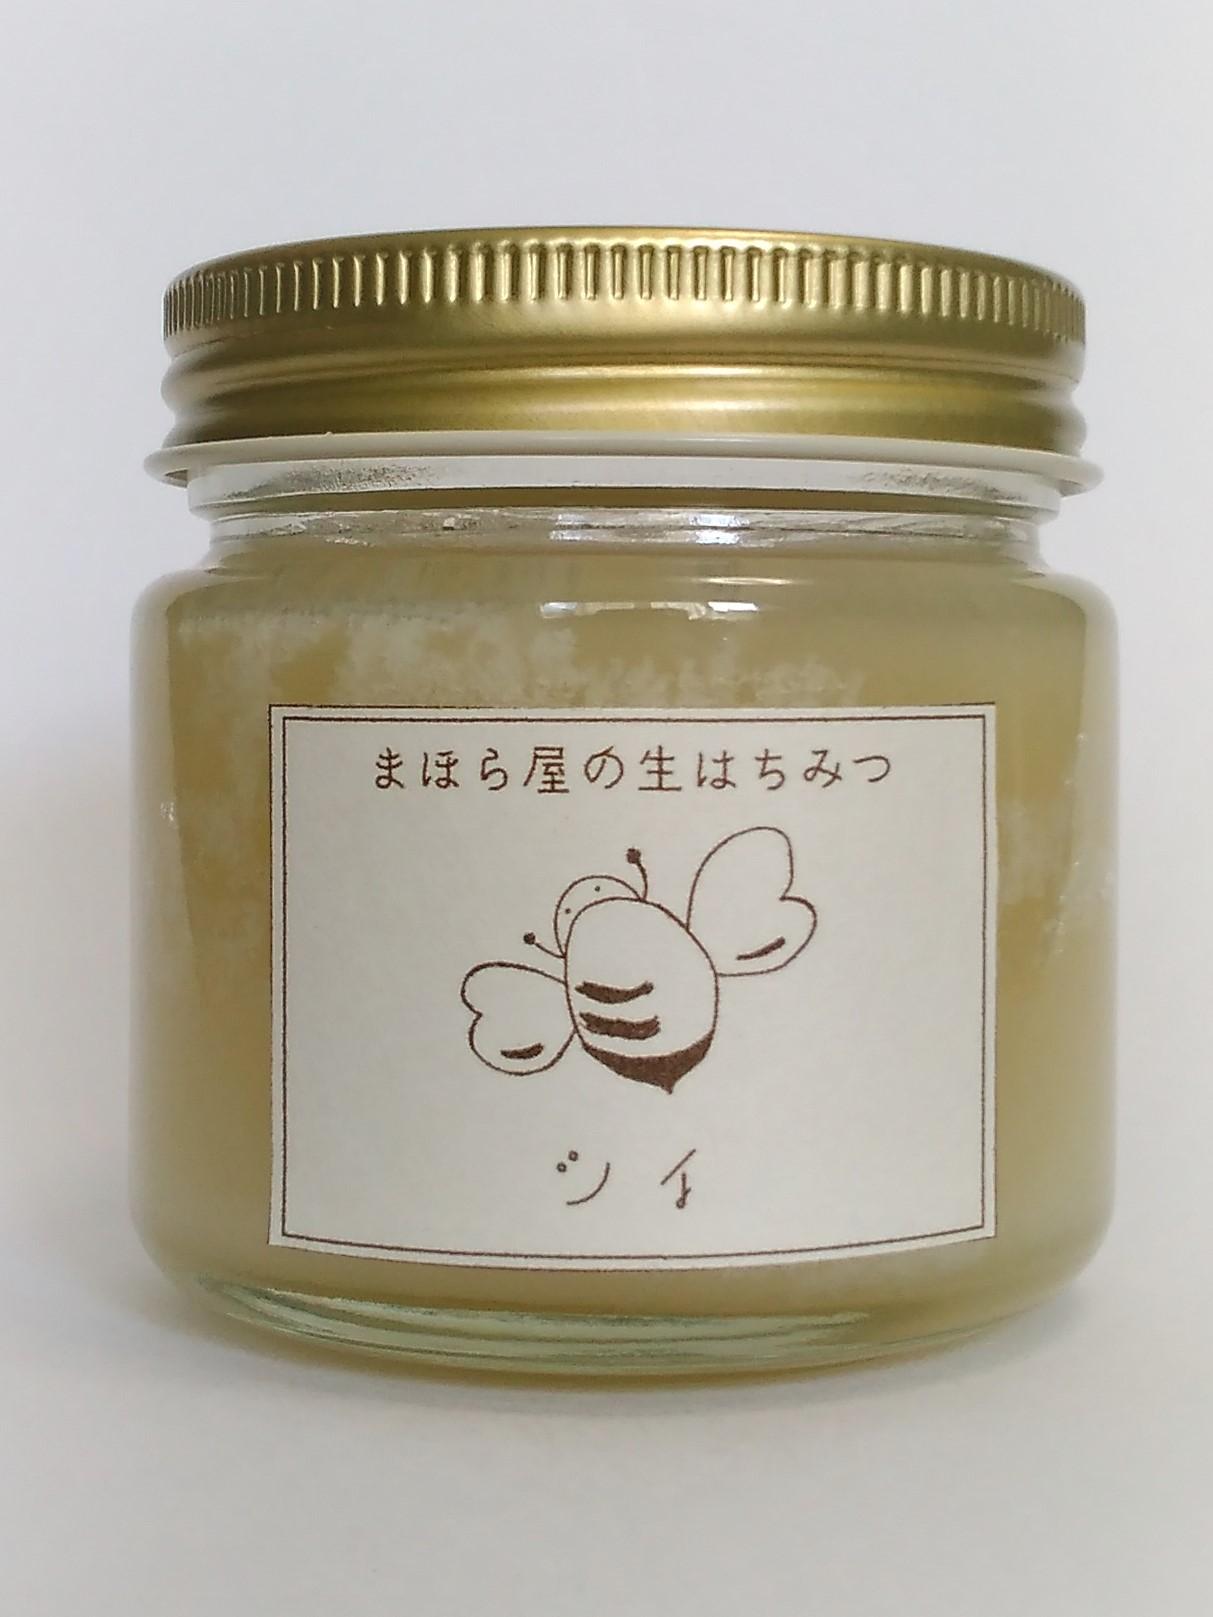 シイ蜂蜜(結晶蜂蜜)150g画像